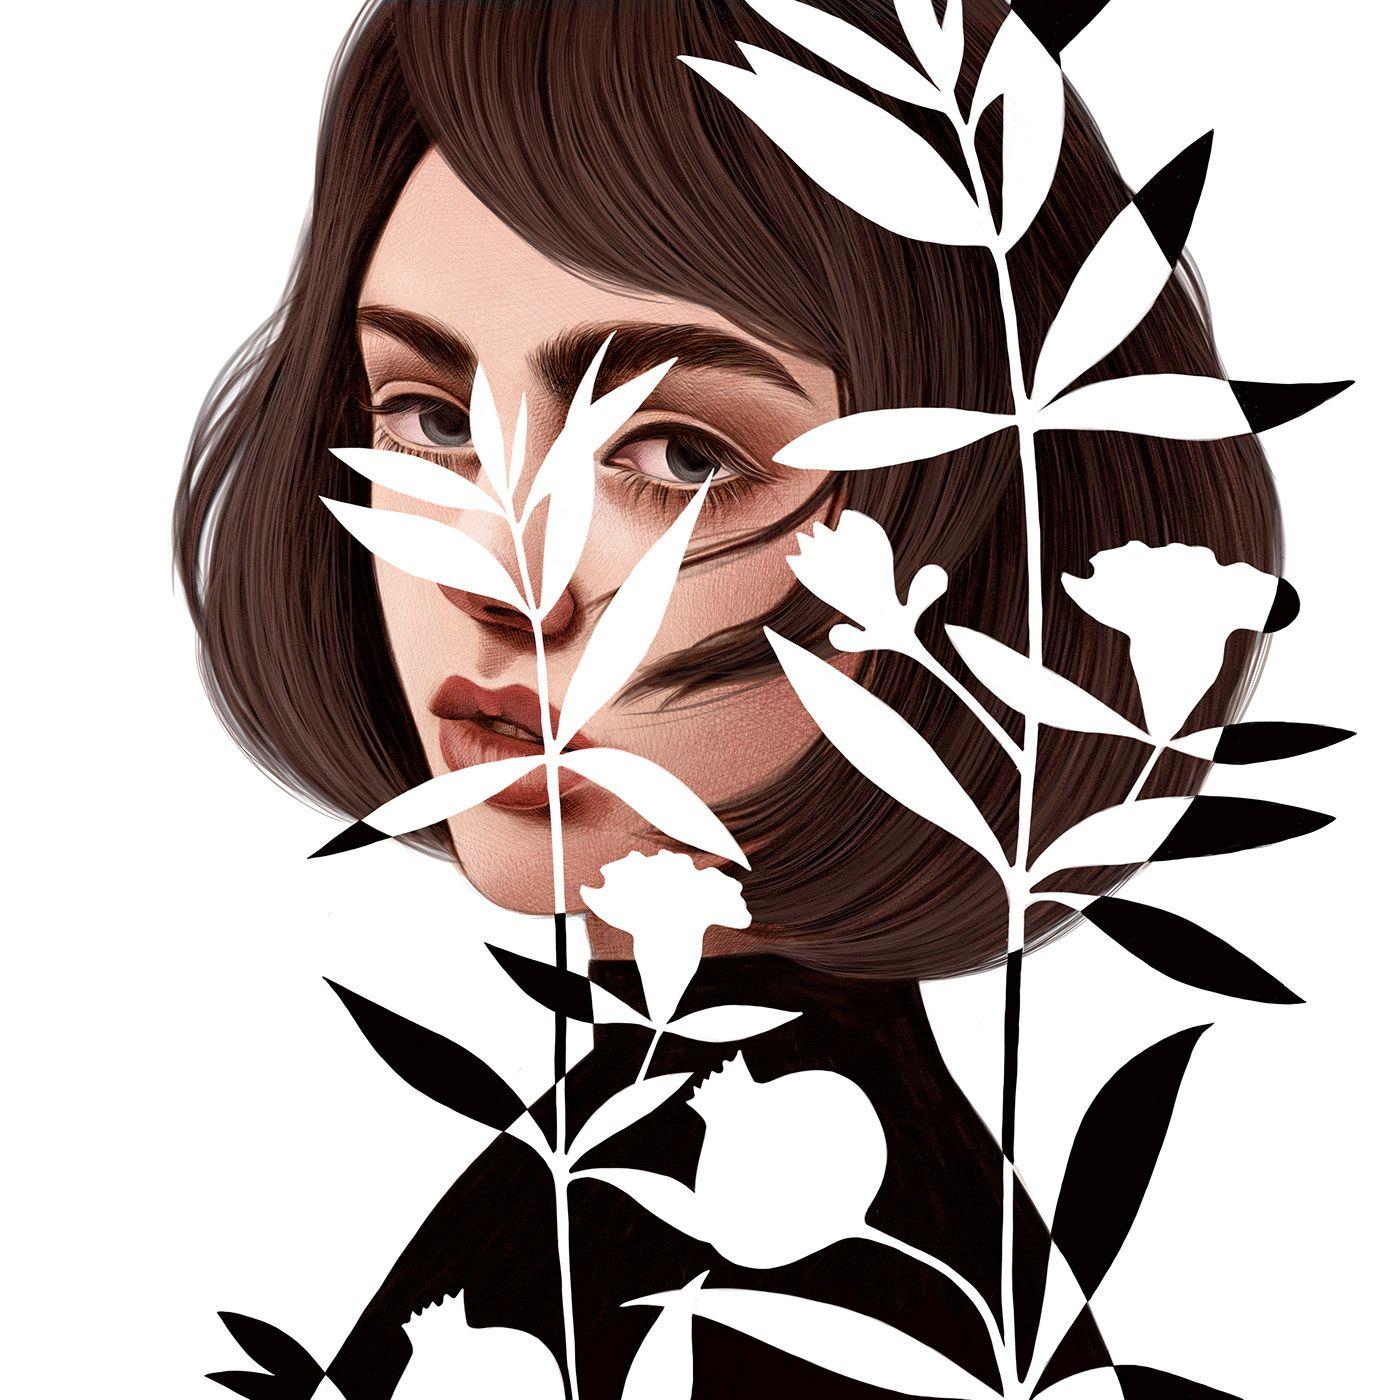 digital illustration woman portrait